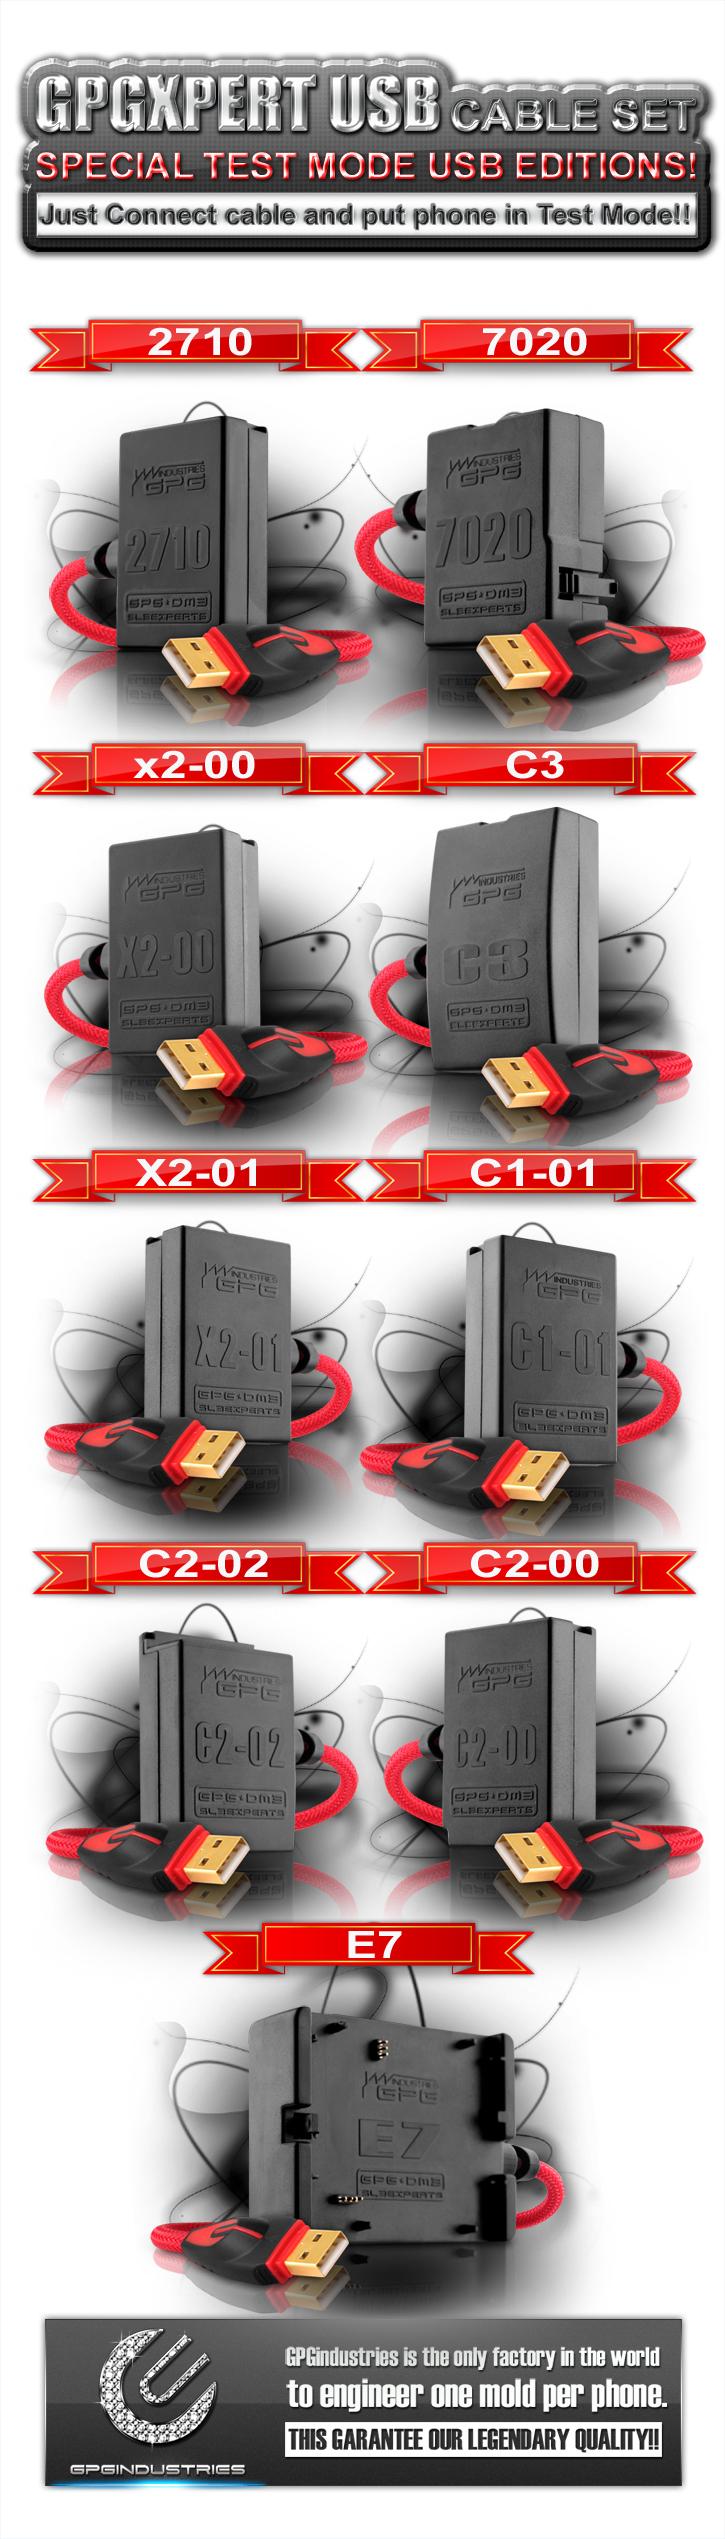 2011 09 26 nokia fbus usb cable set 725